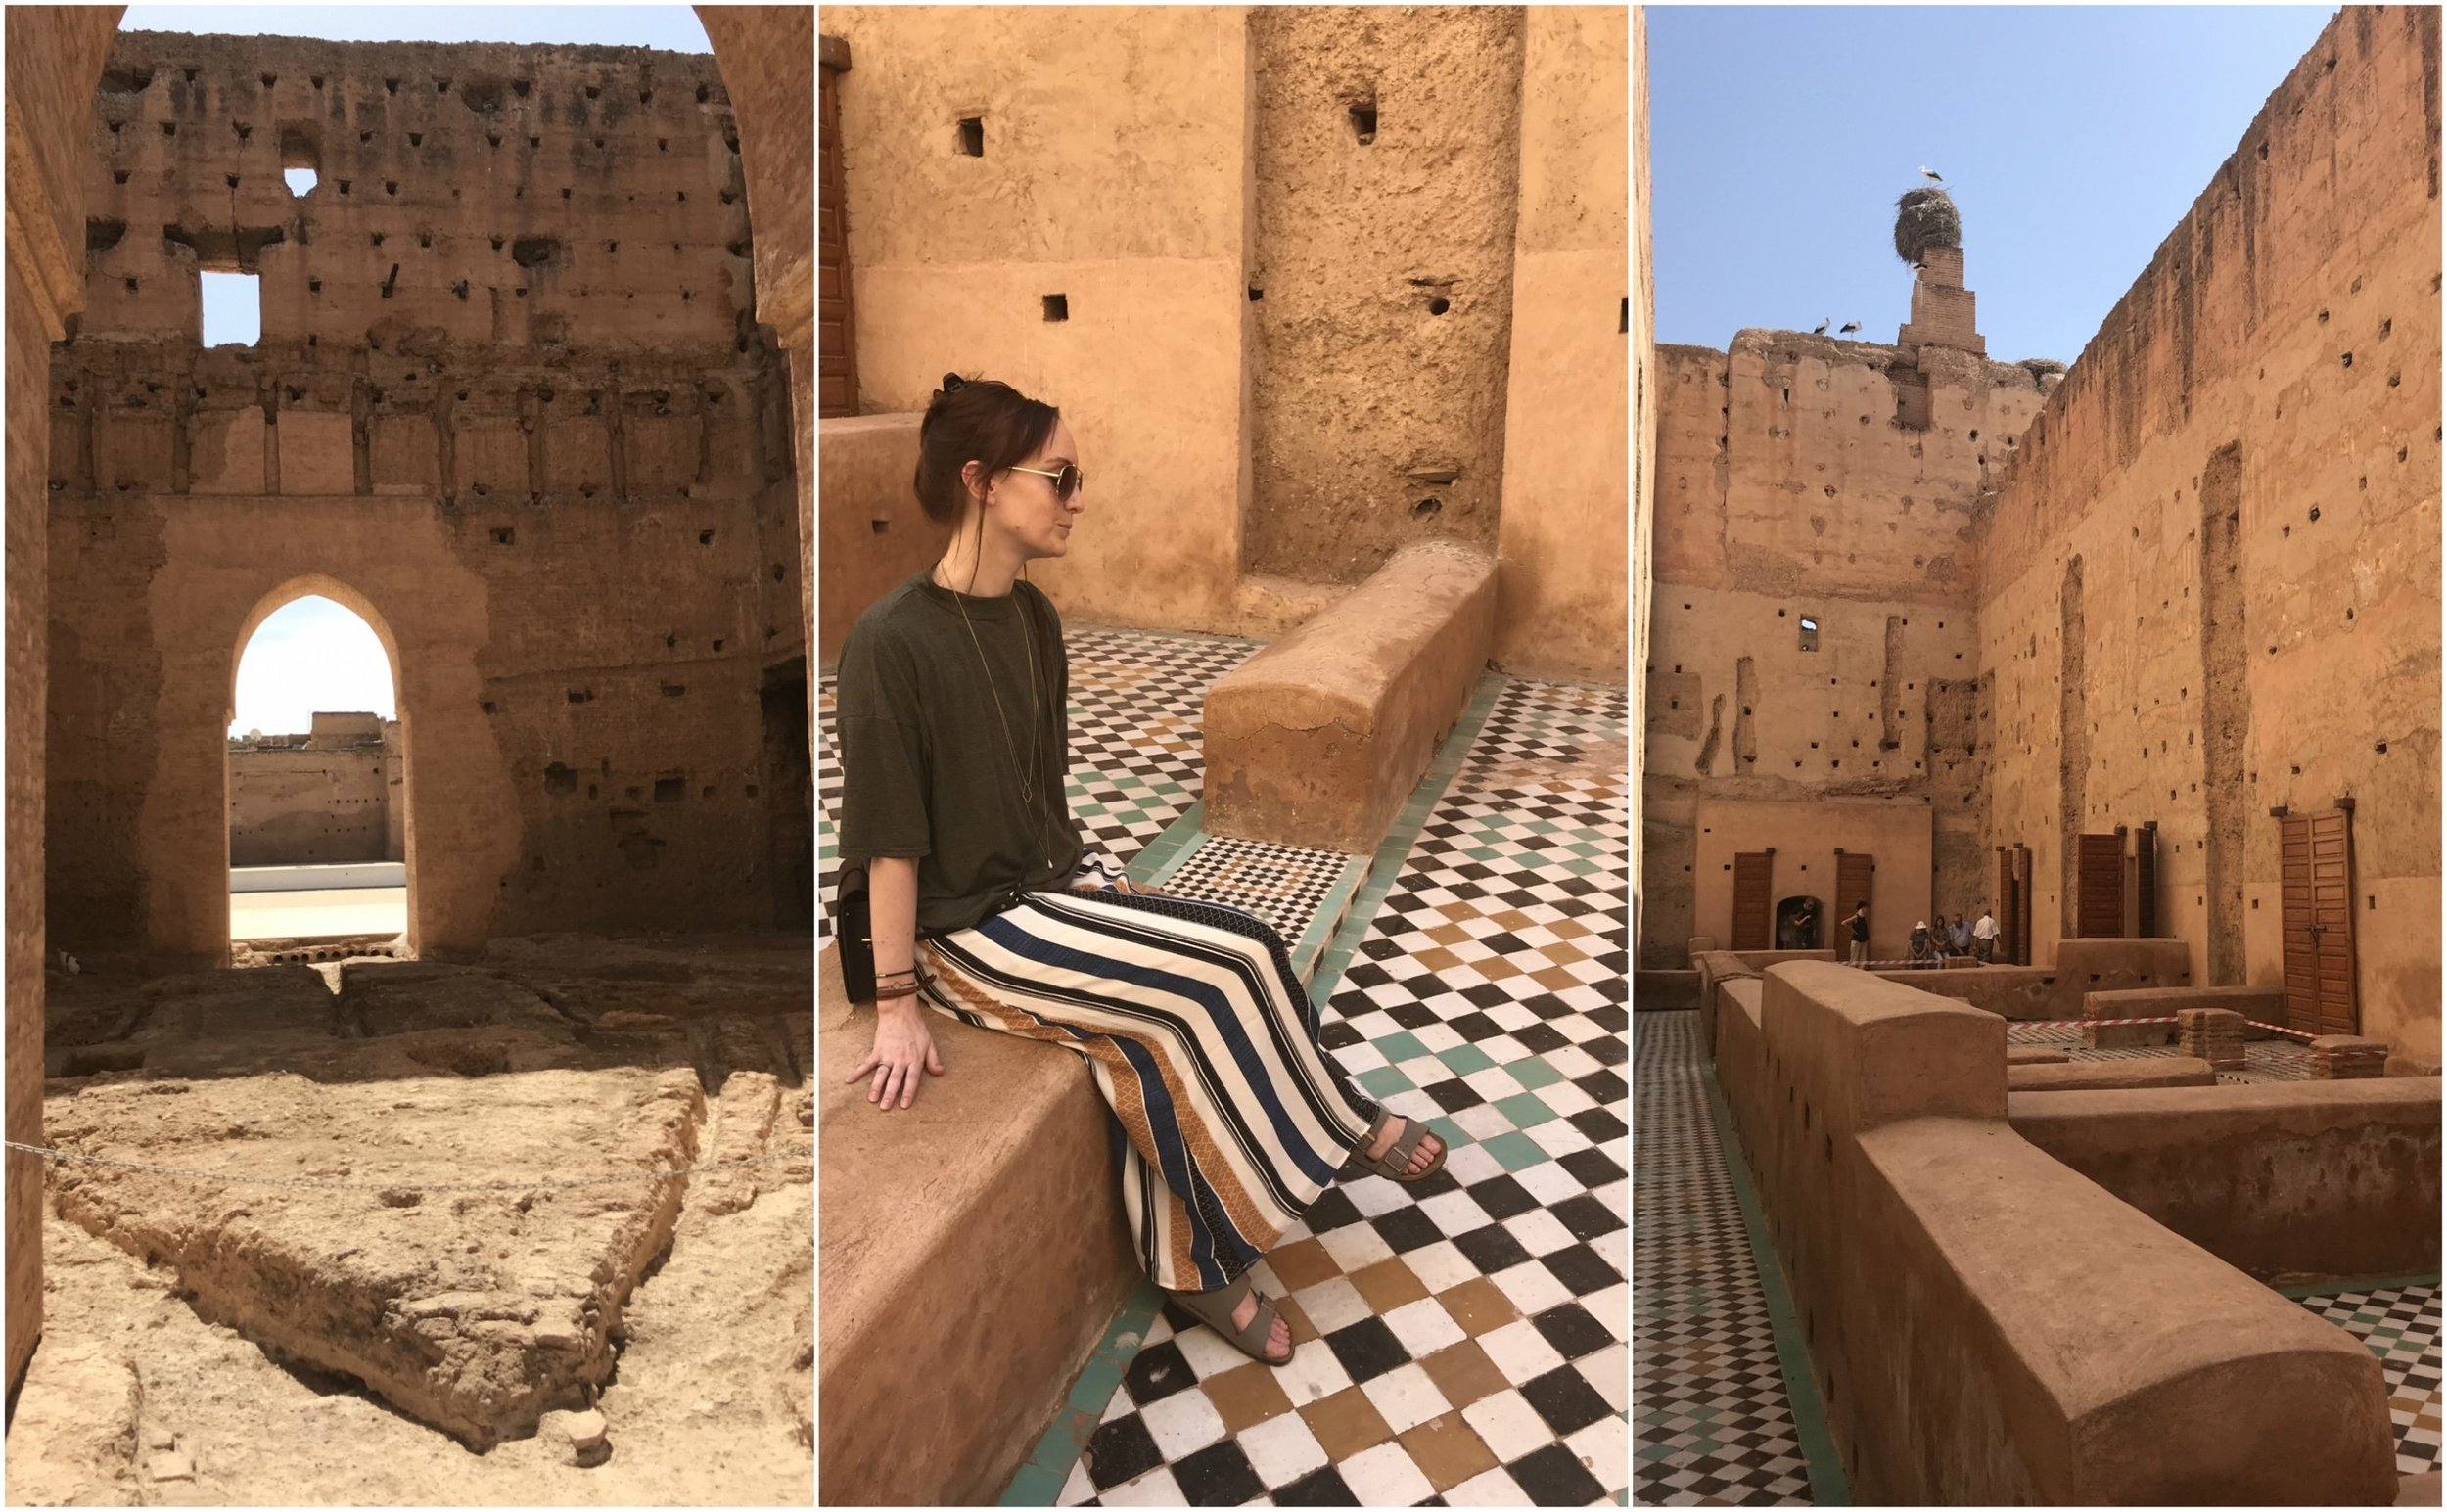 Palais El Badiî, Marrakesh, Morocco - when my pants matched the floor